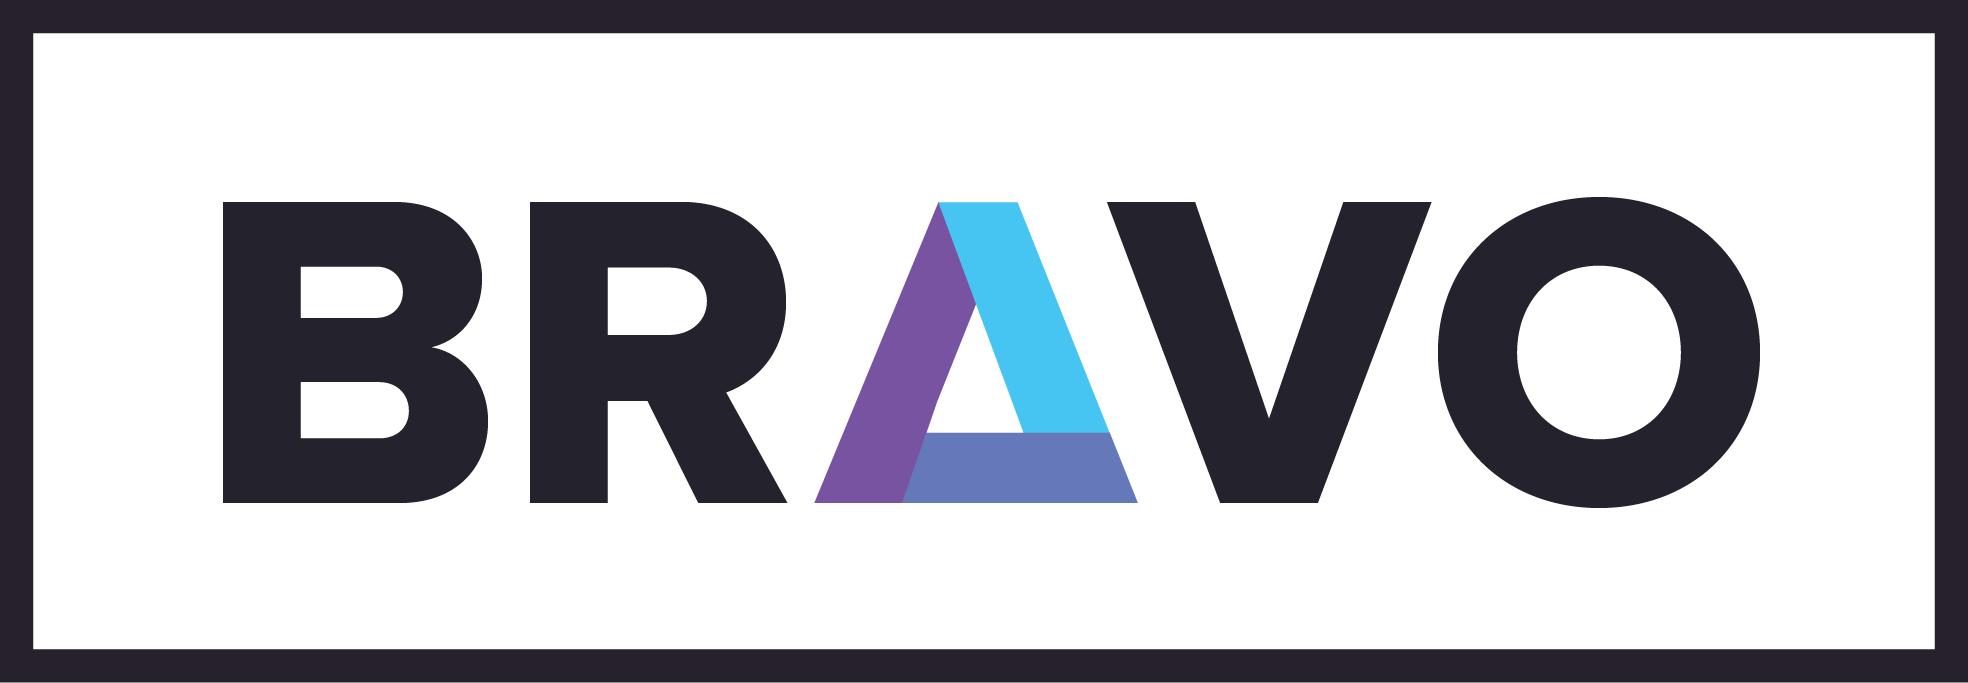 Bravo_logo_color_square